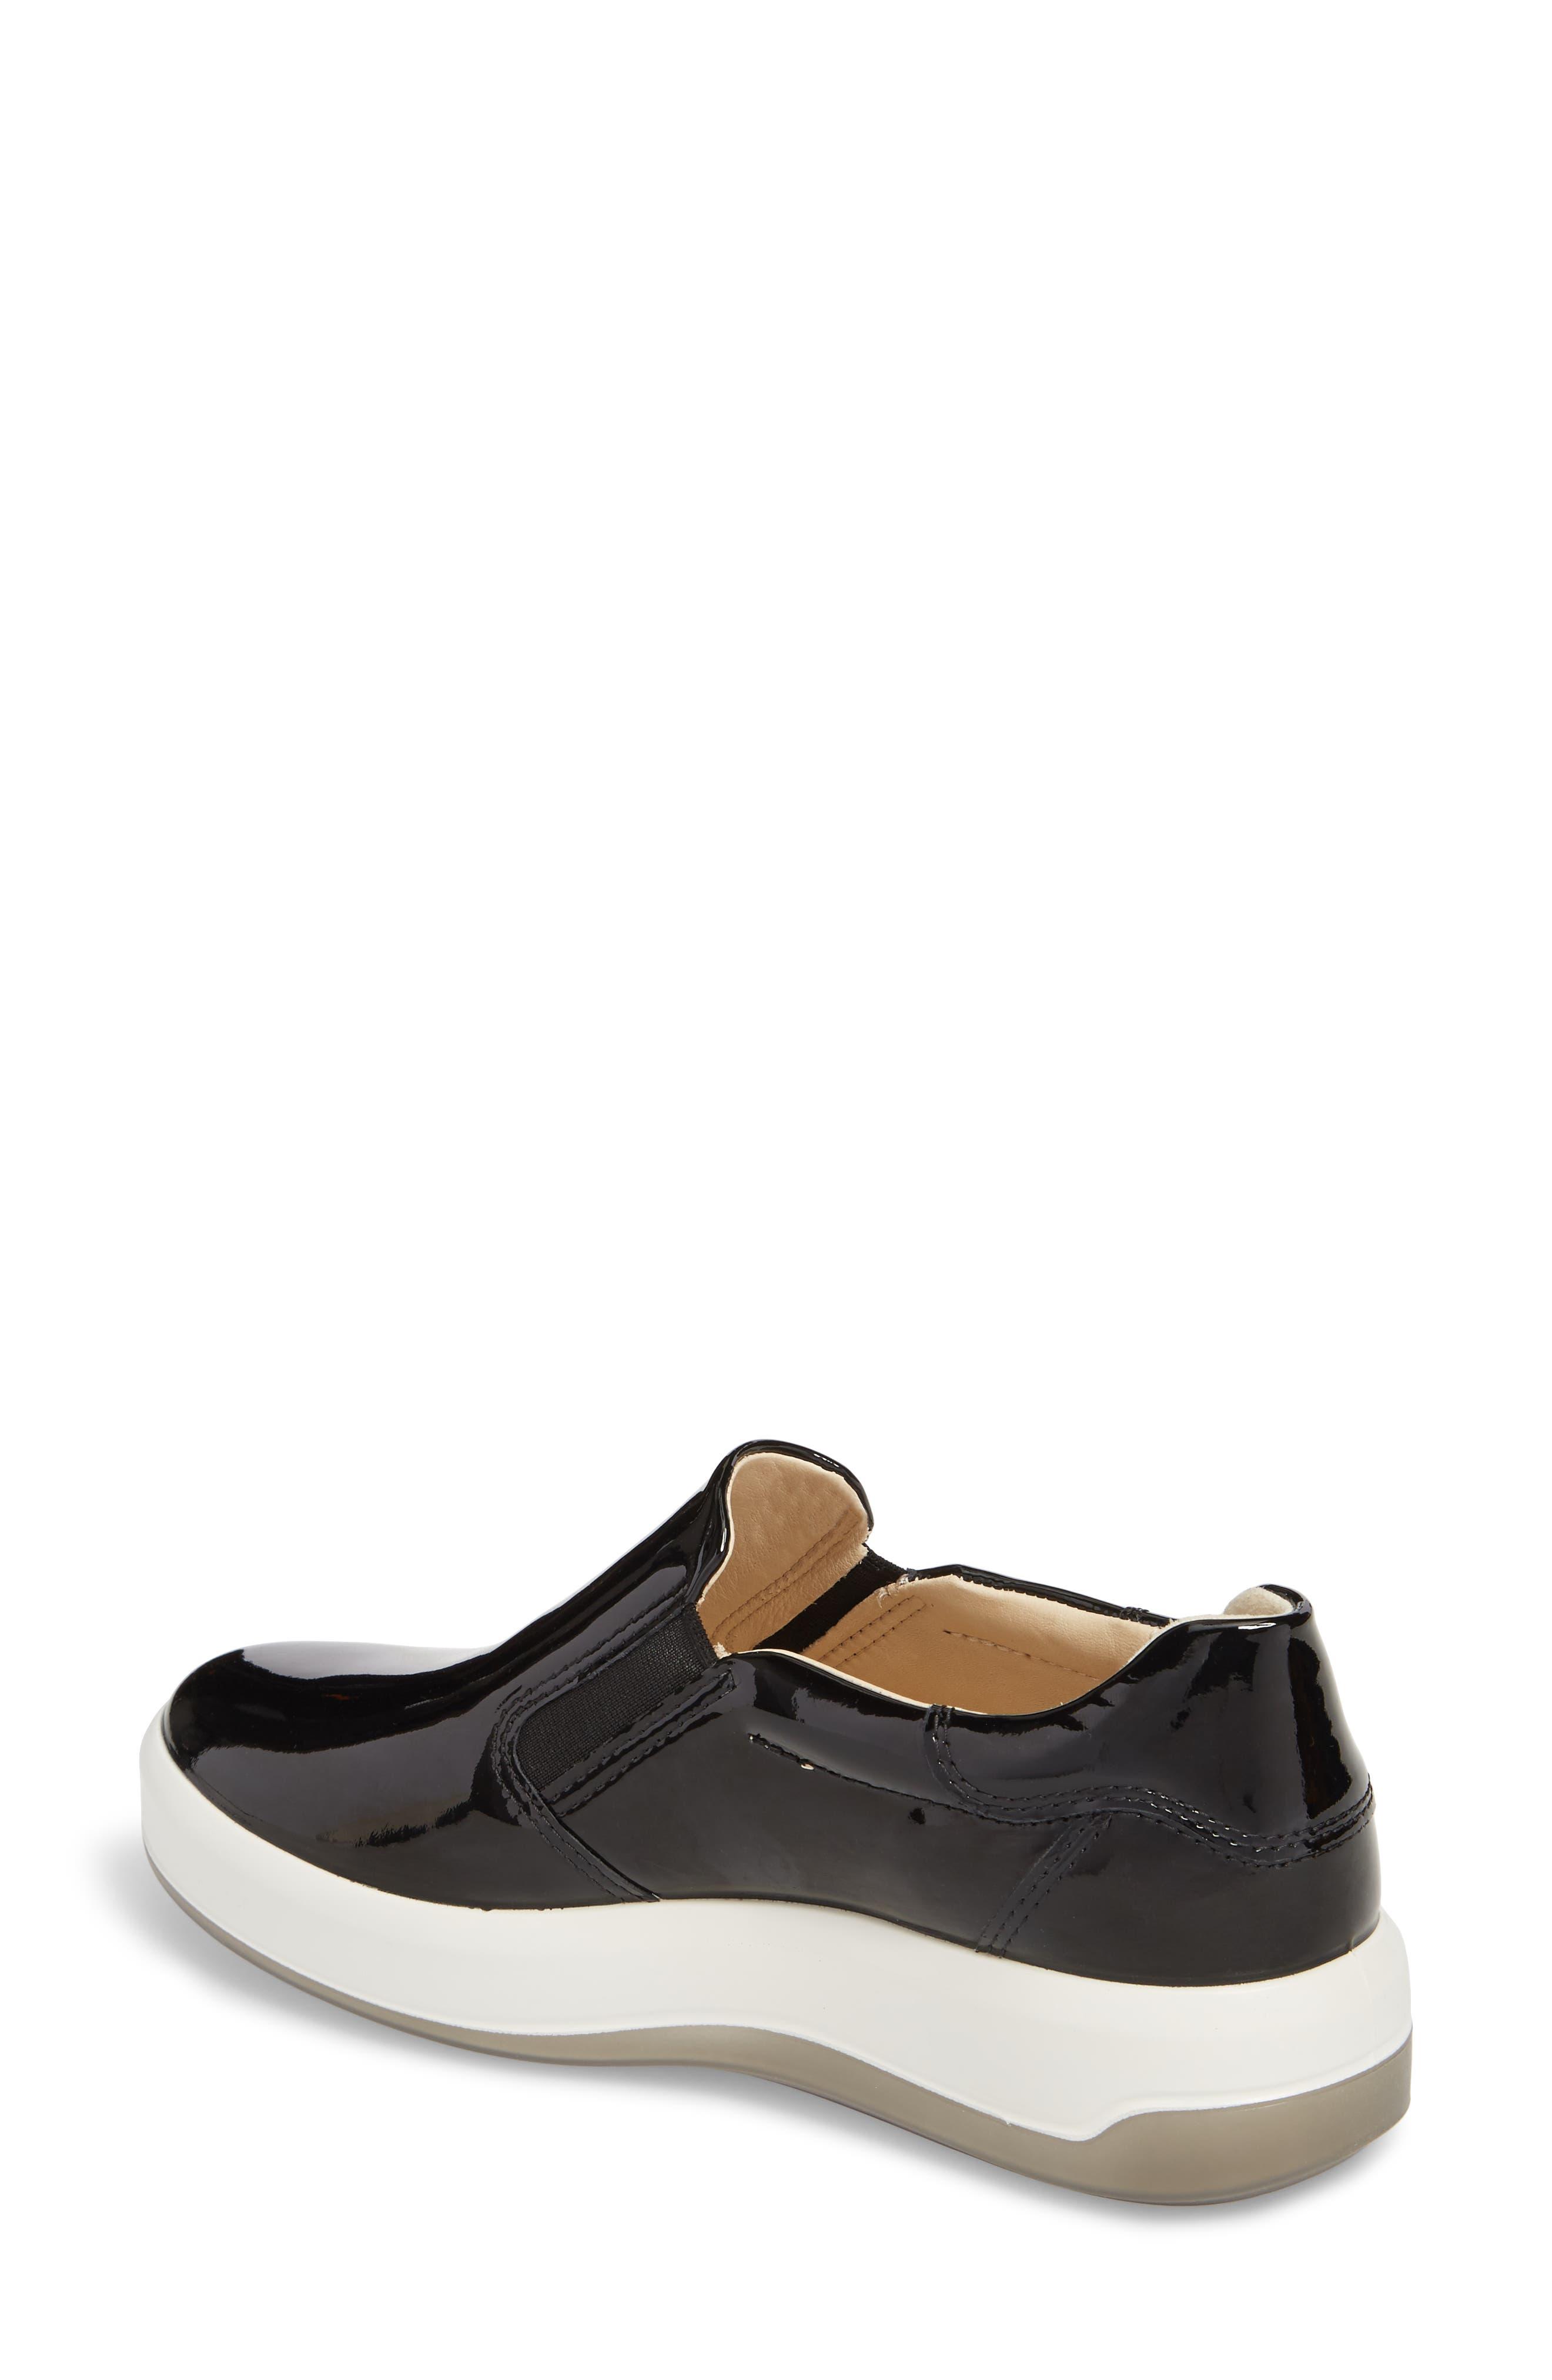 Soft 9 Slip-On Sneaker,                             Alternate thumbnail 2, color,                             Black Patent Leather